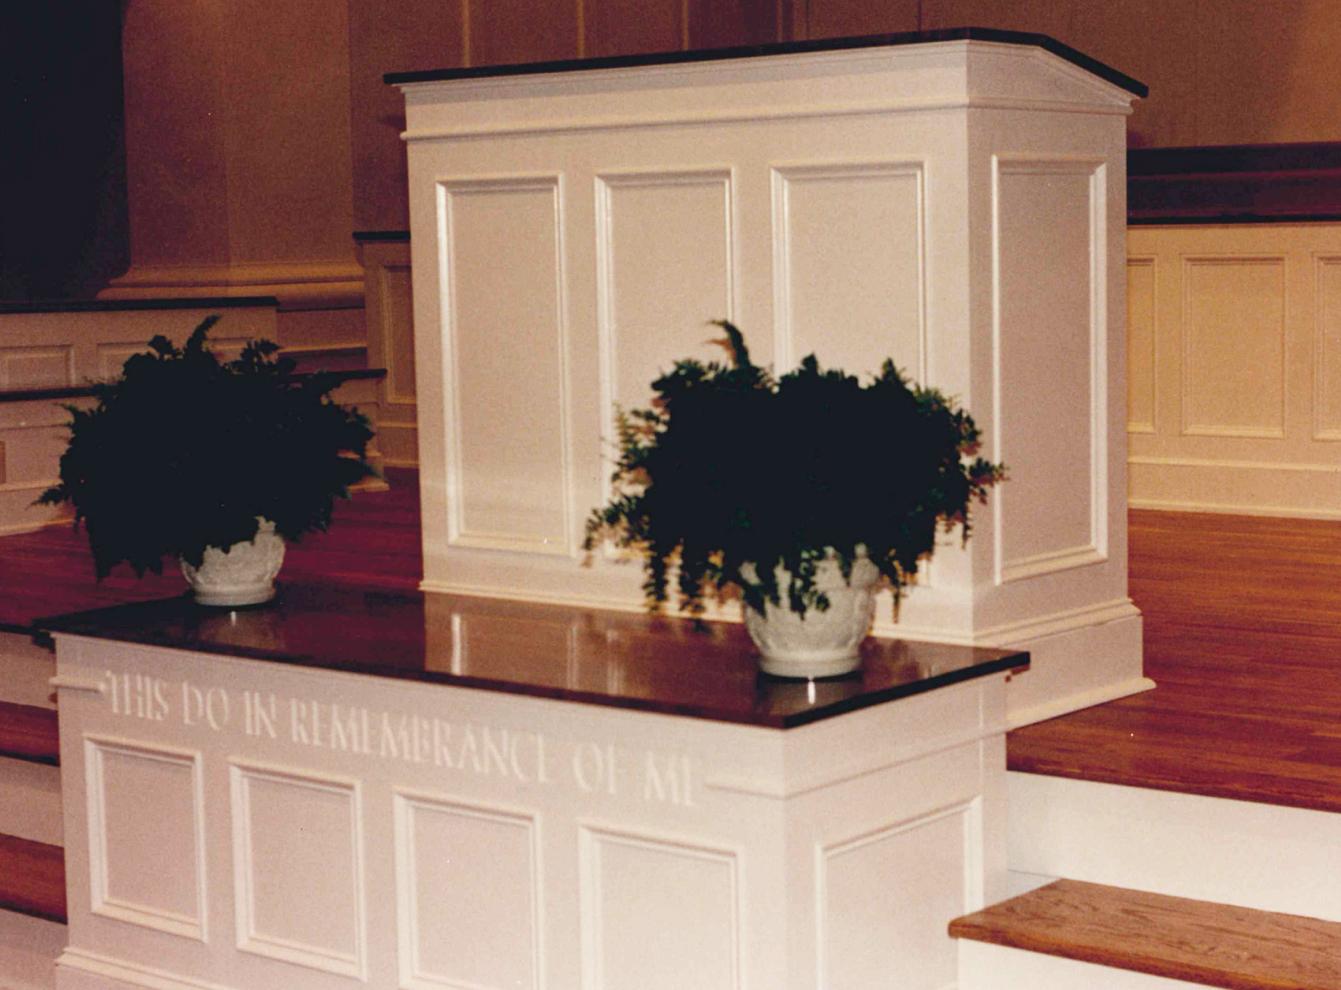 FIRST BAPTIST CHURCH - KINGSPORT, TN